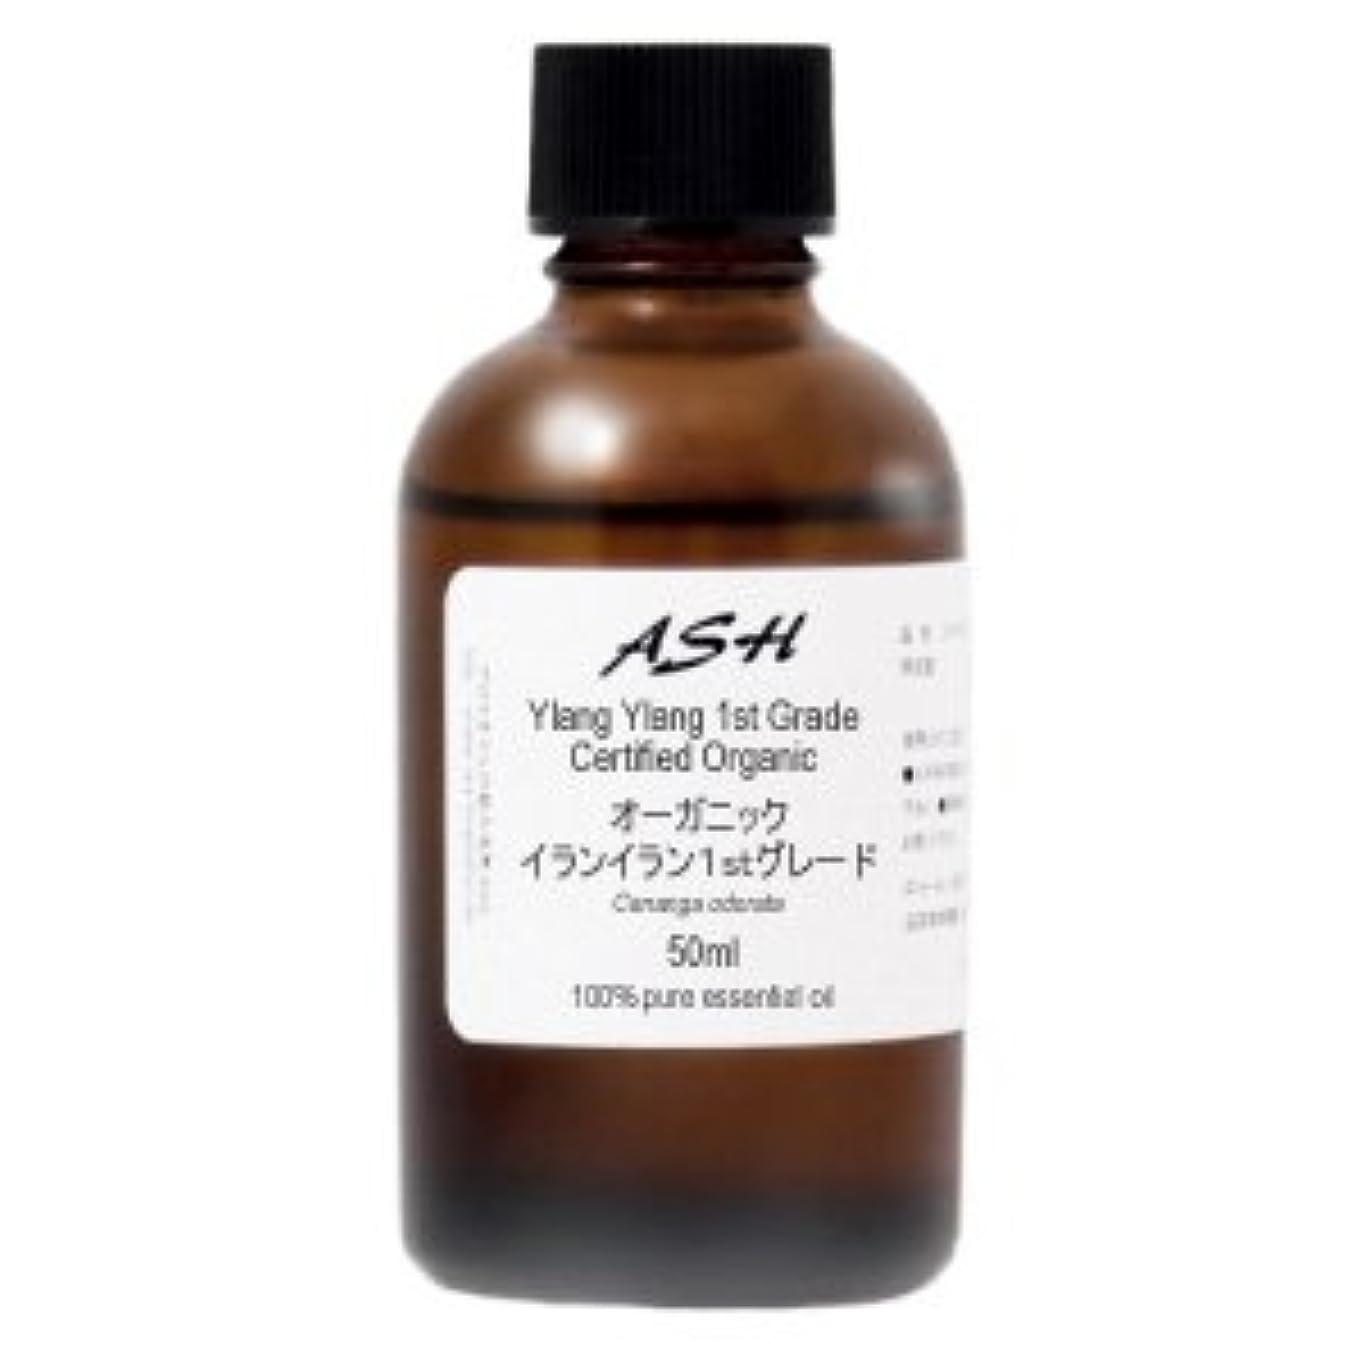 ASH オーガニック イランイラン 1stグレード エッセンシャルオイル 50ml AEAJ表示基準適合認定精油